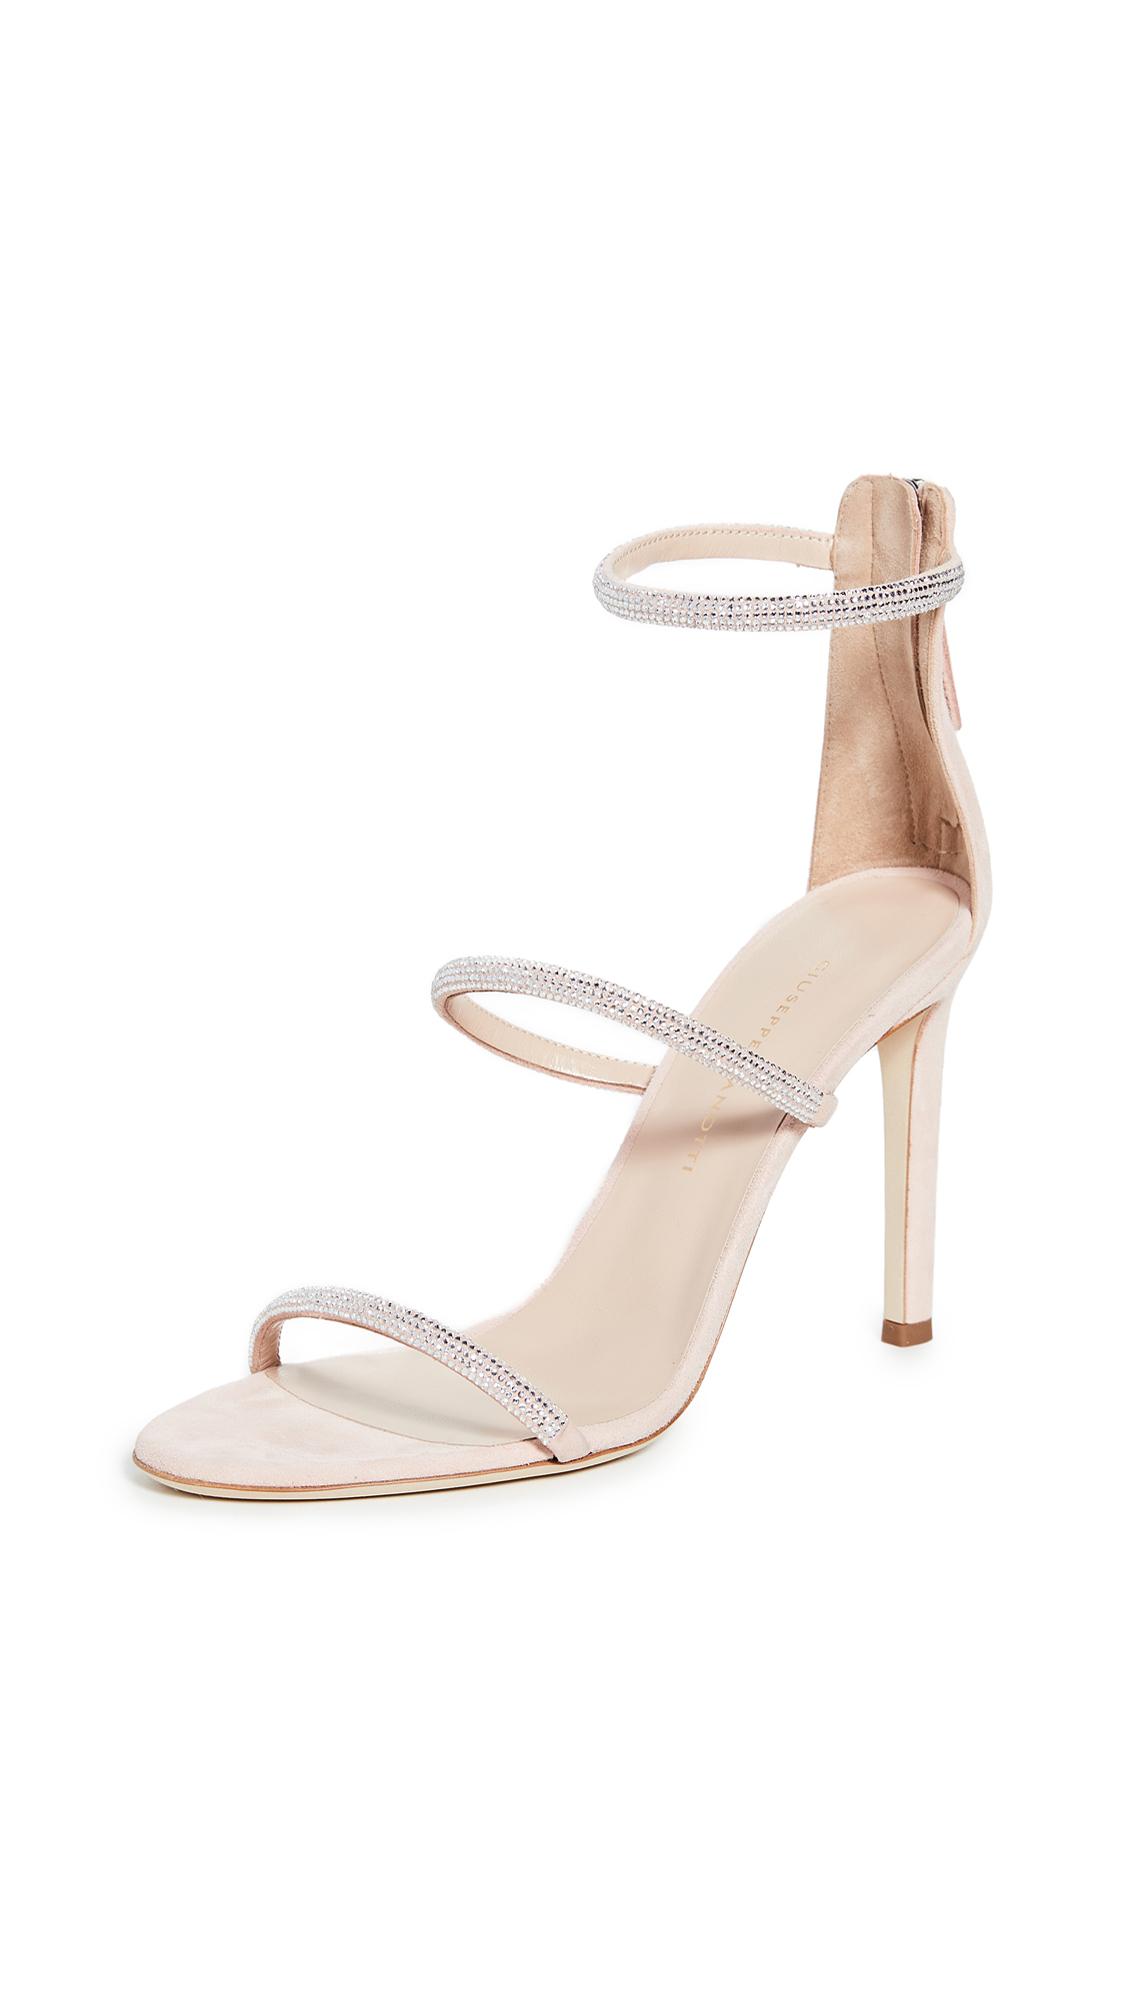 Buy Giuseppe Zanotti online - photo of Giuseppe Zanotti Basic Sandals 105mm